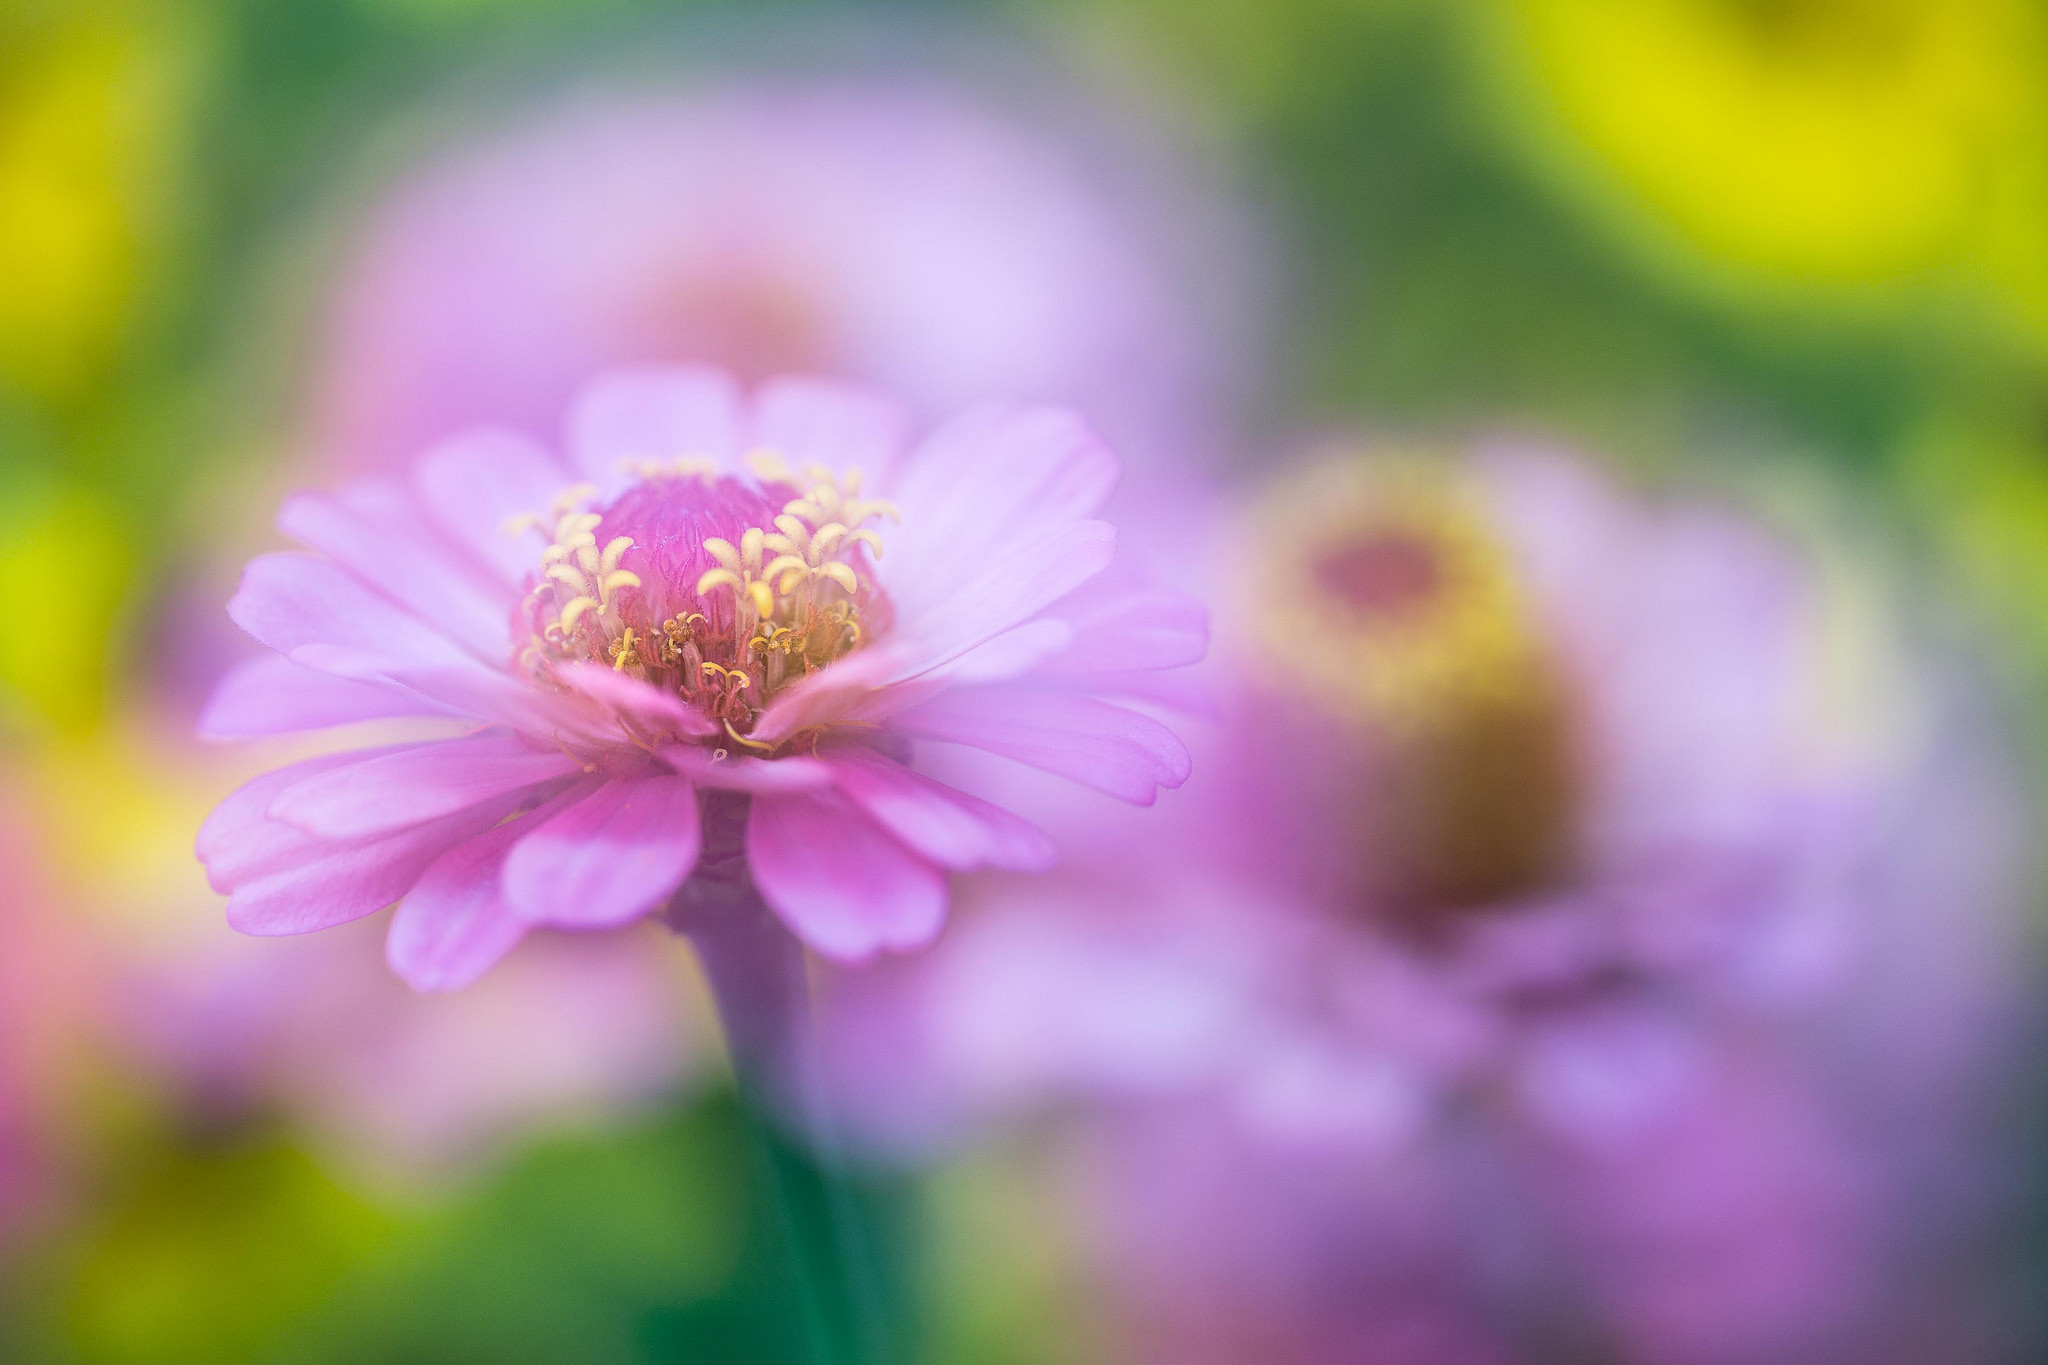 обои цветок, цветы, макро, флора картинки фото